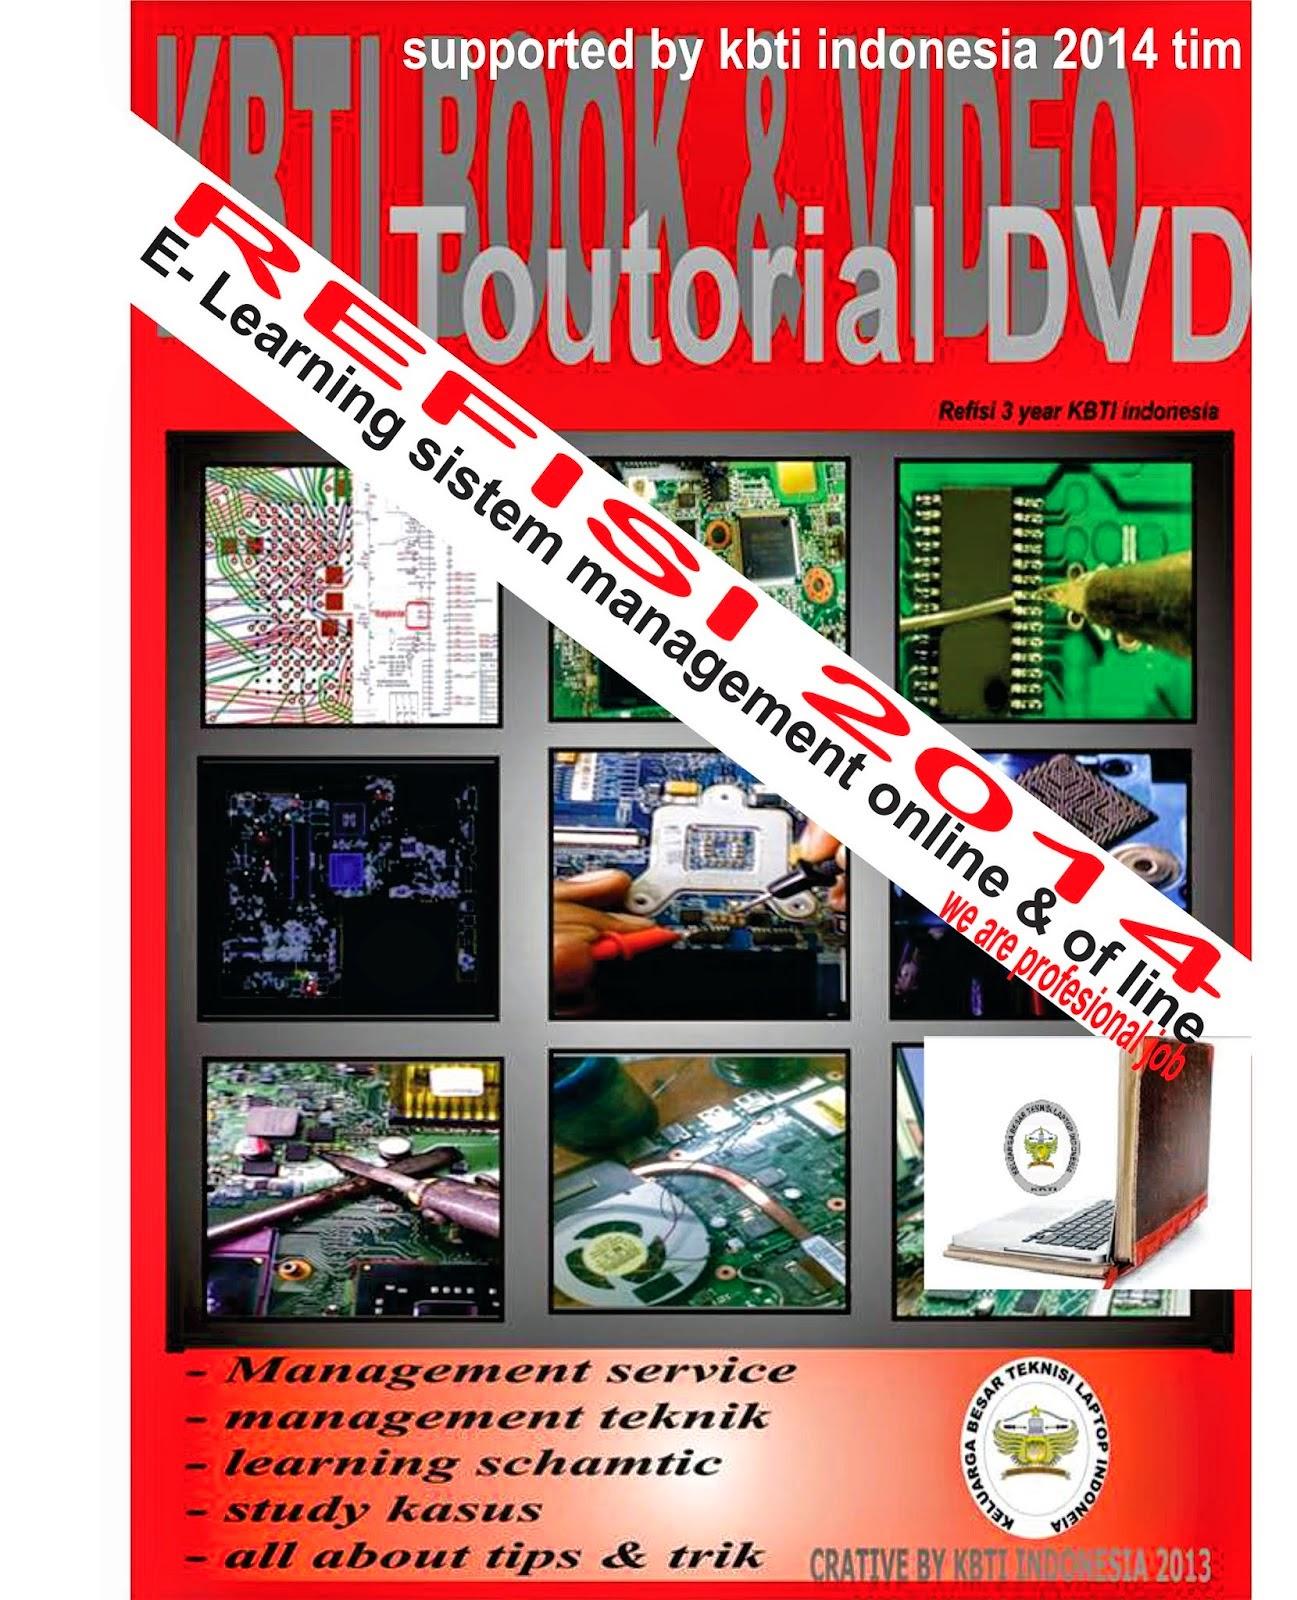 KBTI DVD 2014 (TOUTORIAL)